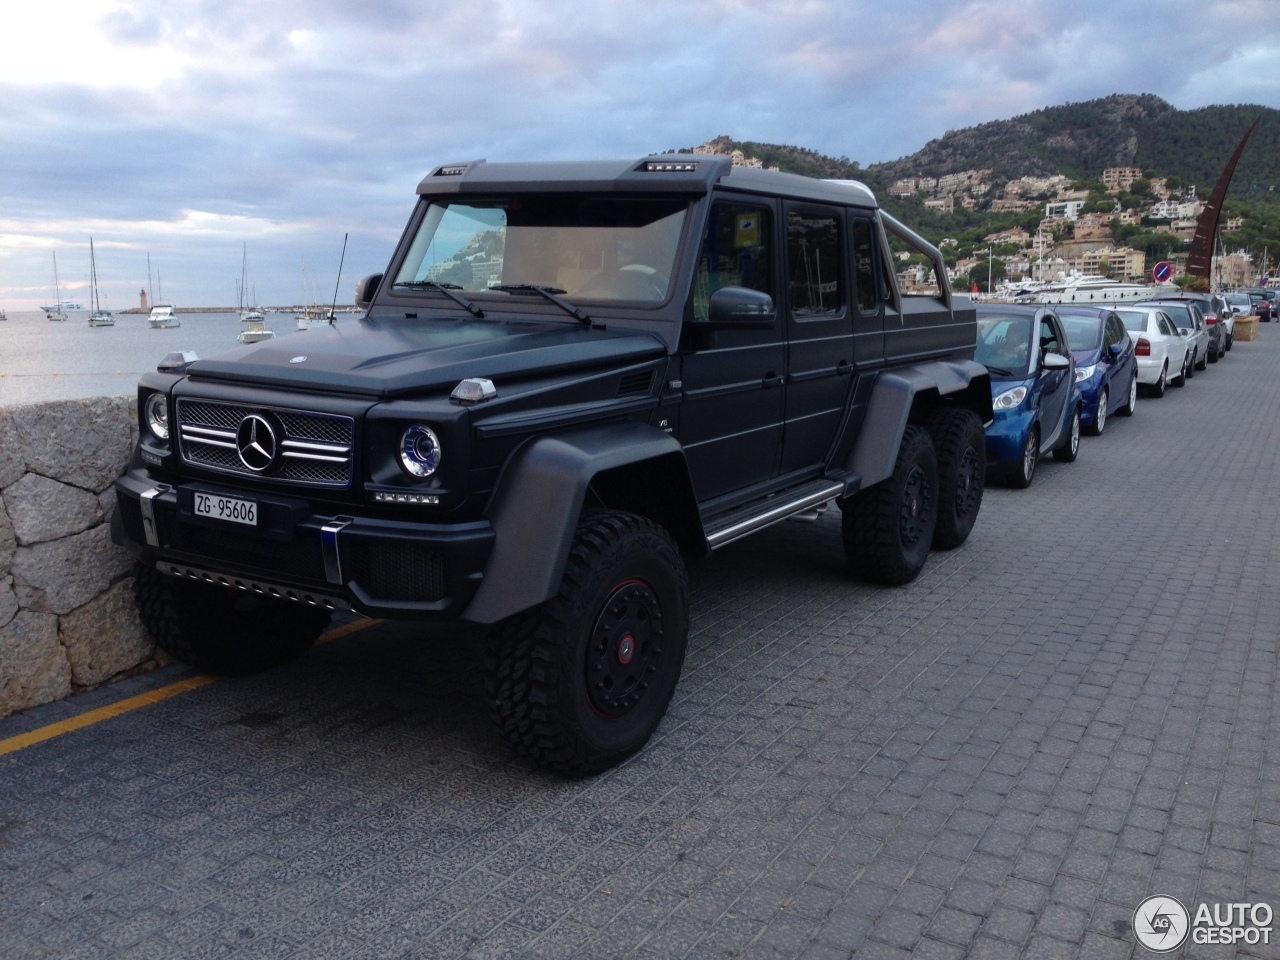 Mercedes benz g 63 amg 6x6 17 october 2014 autogespot for Mercedes benz amg 6x6 price